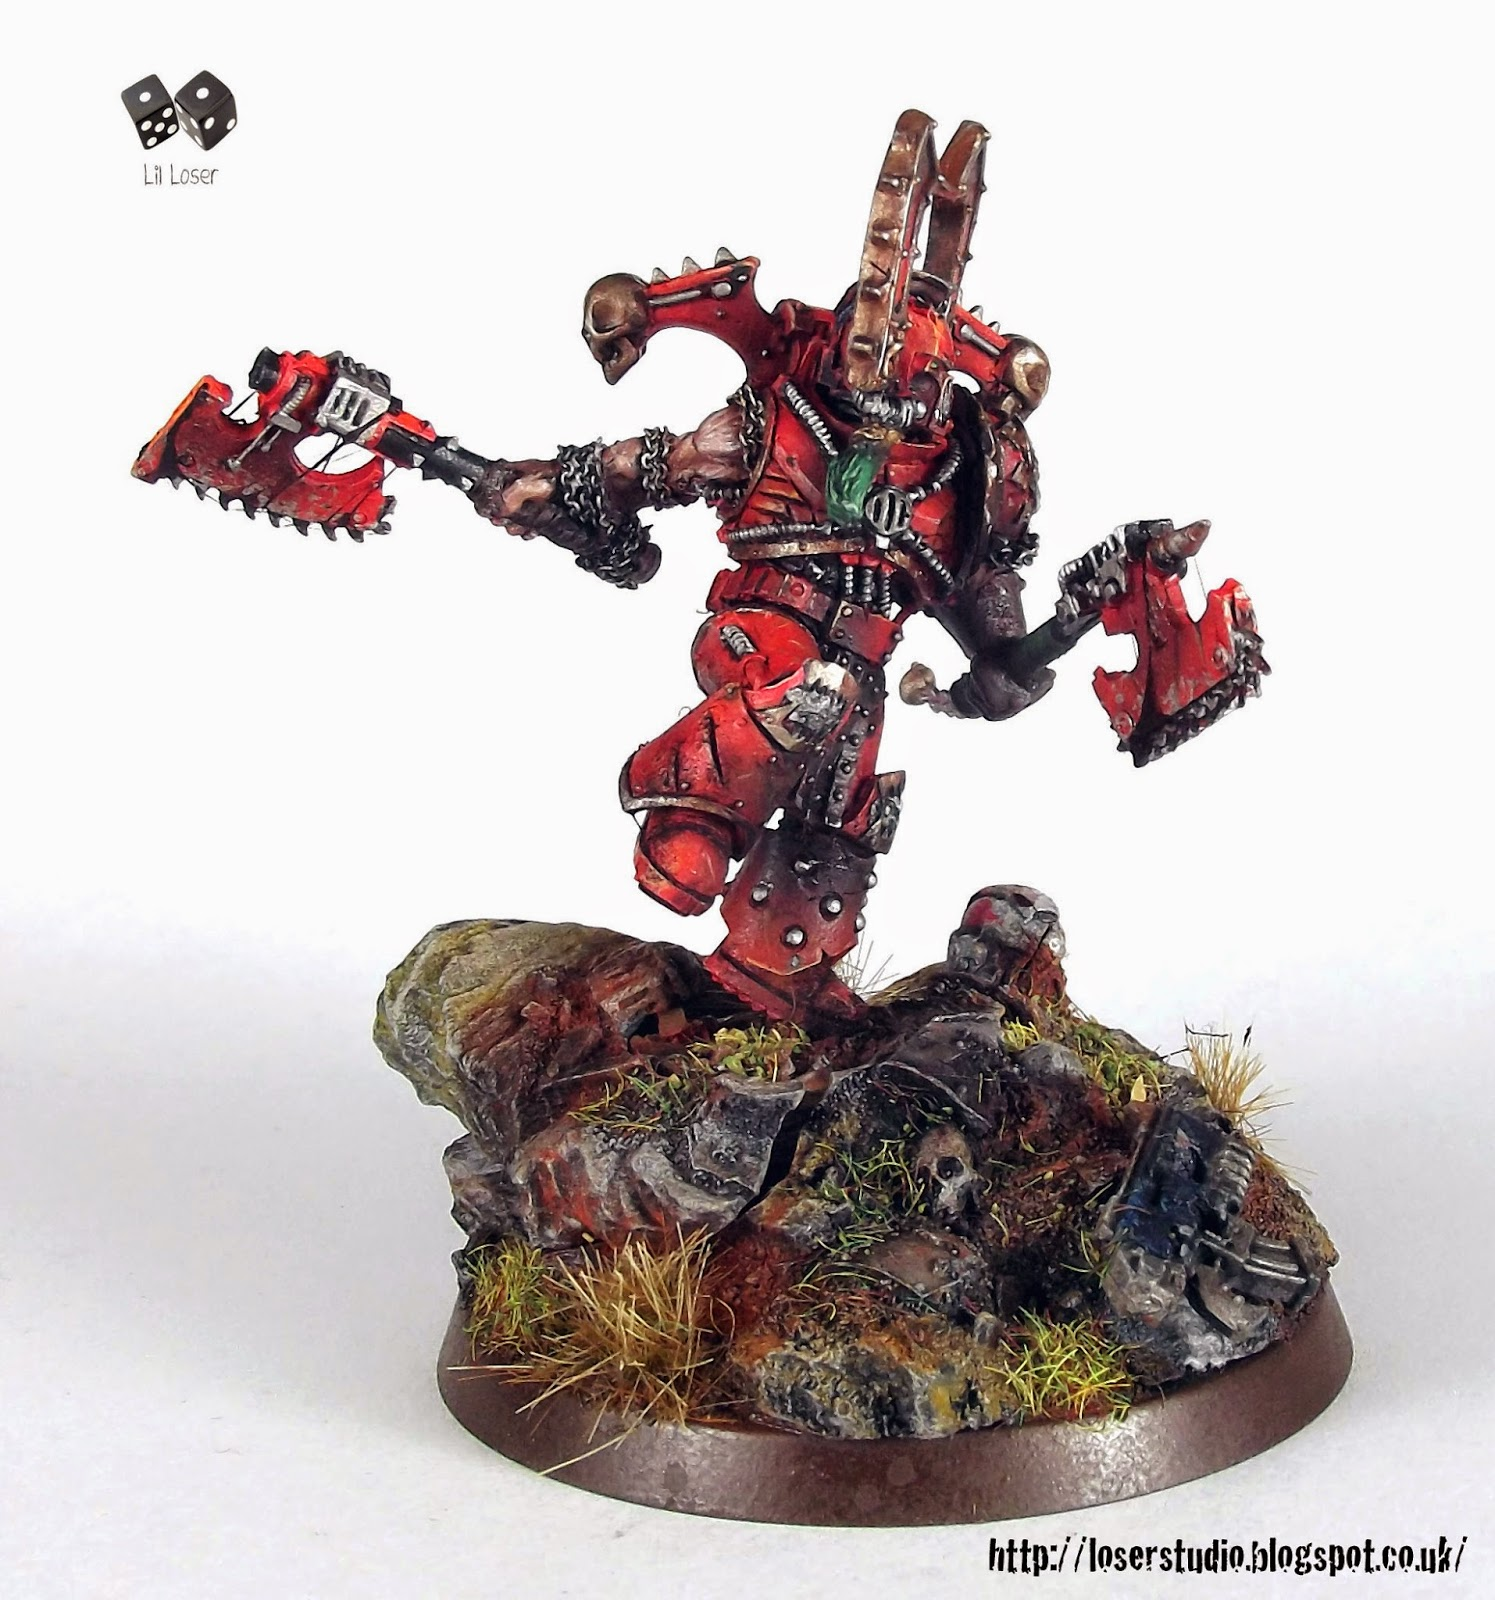 Kharn the Betrayer Heresy Miniature Conversion   Wargaming Hub